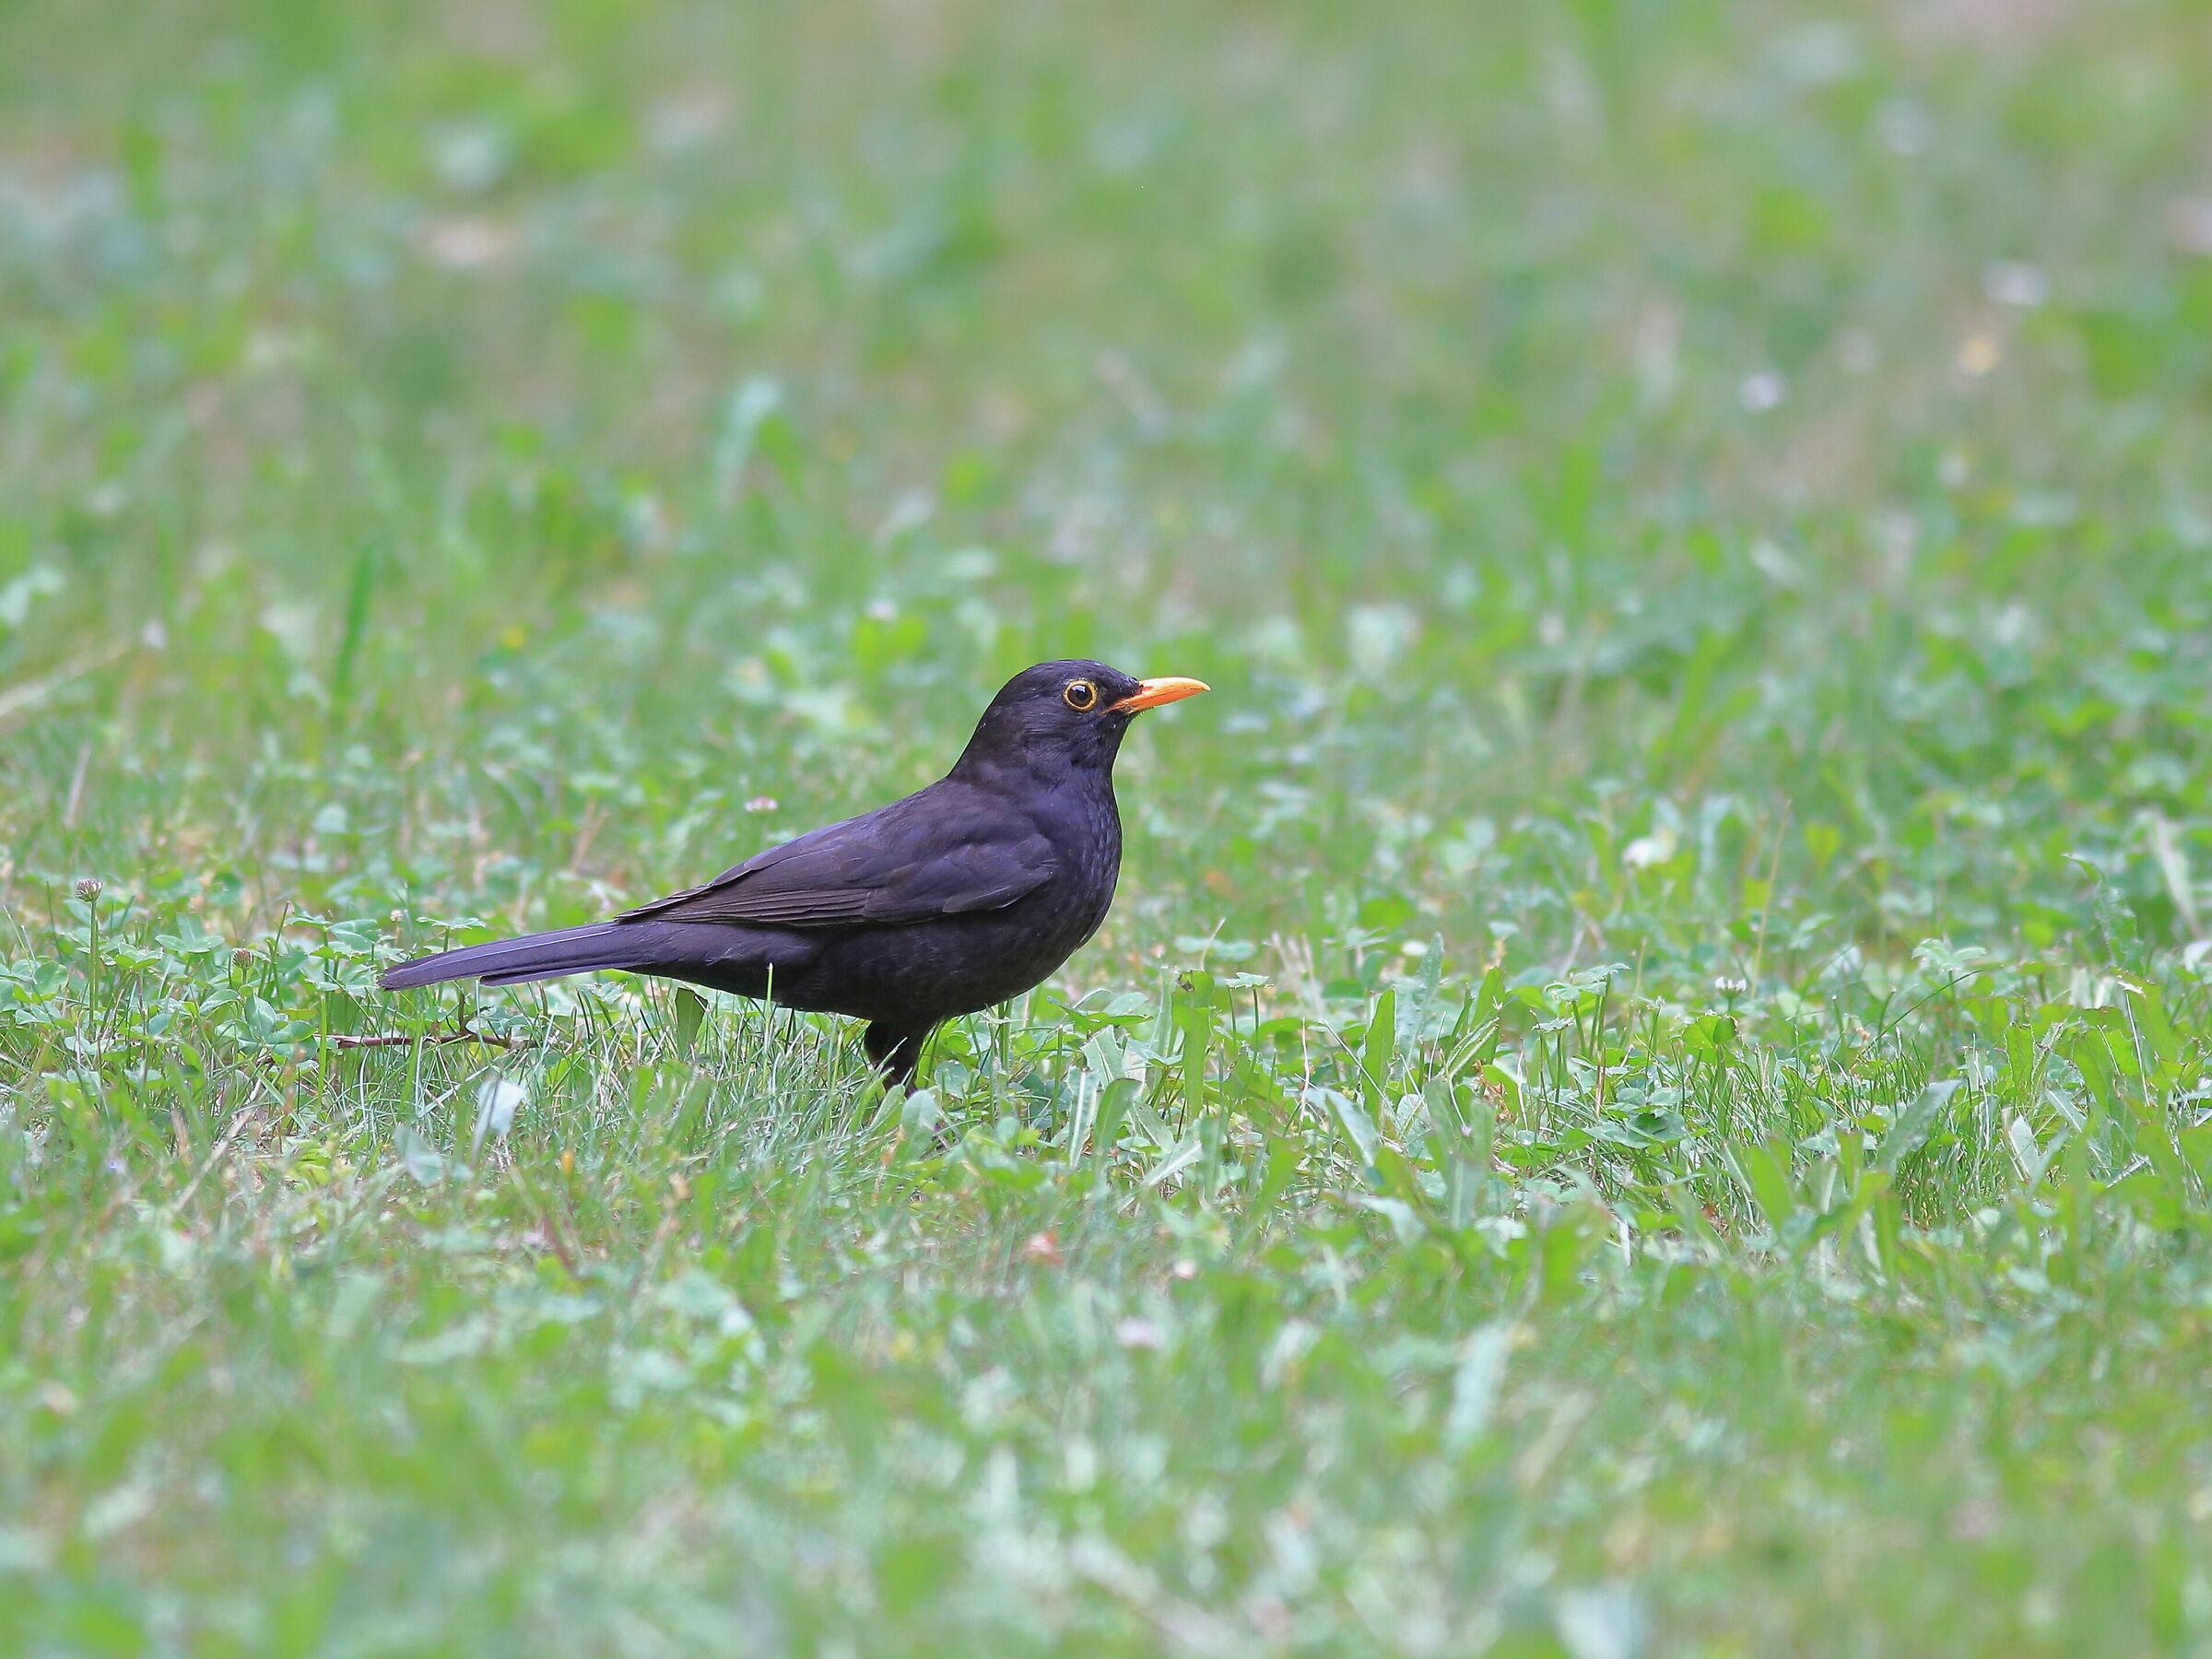 blackbird on the walk watch in May...